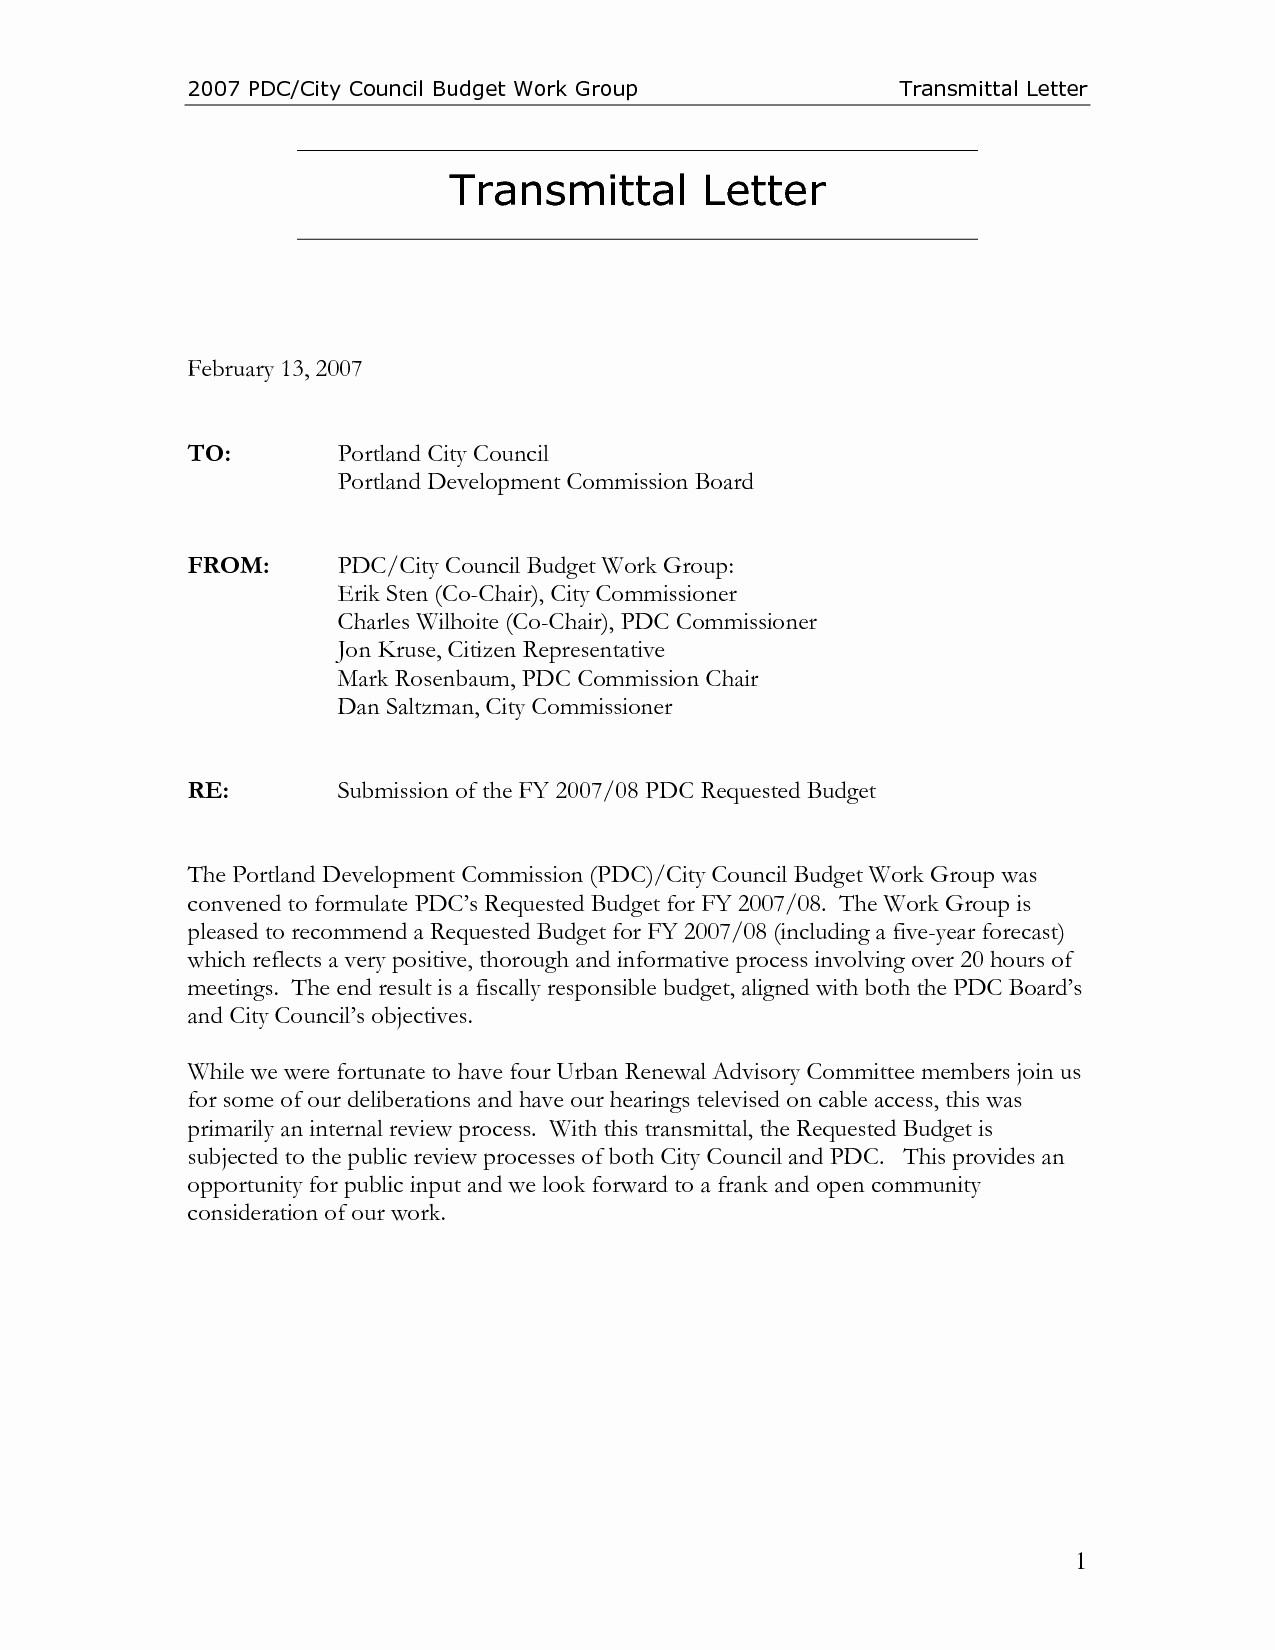 Sample Of Letter Of Transmittal Elegant Letter Transmittal Template Construction Collection